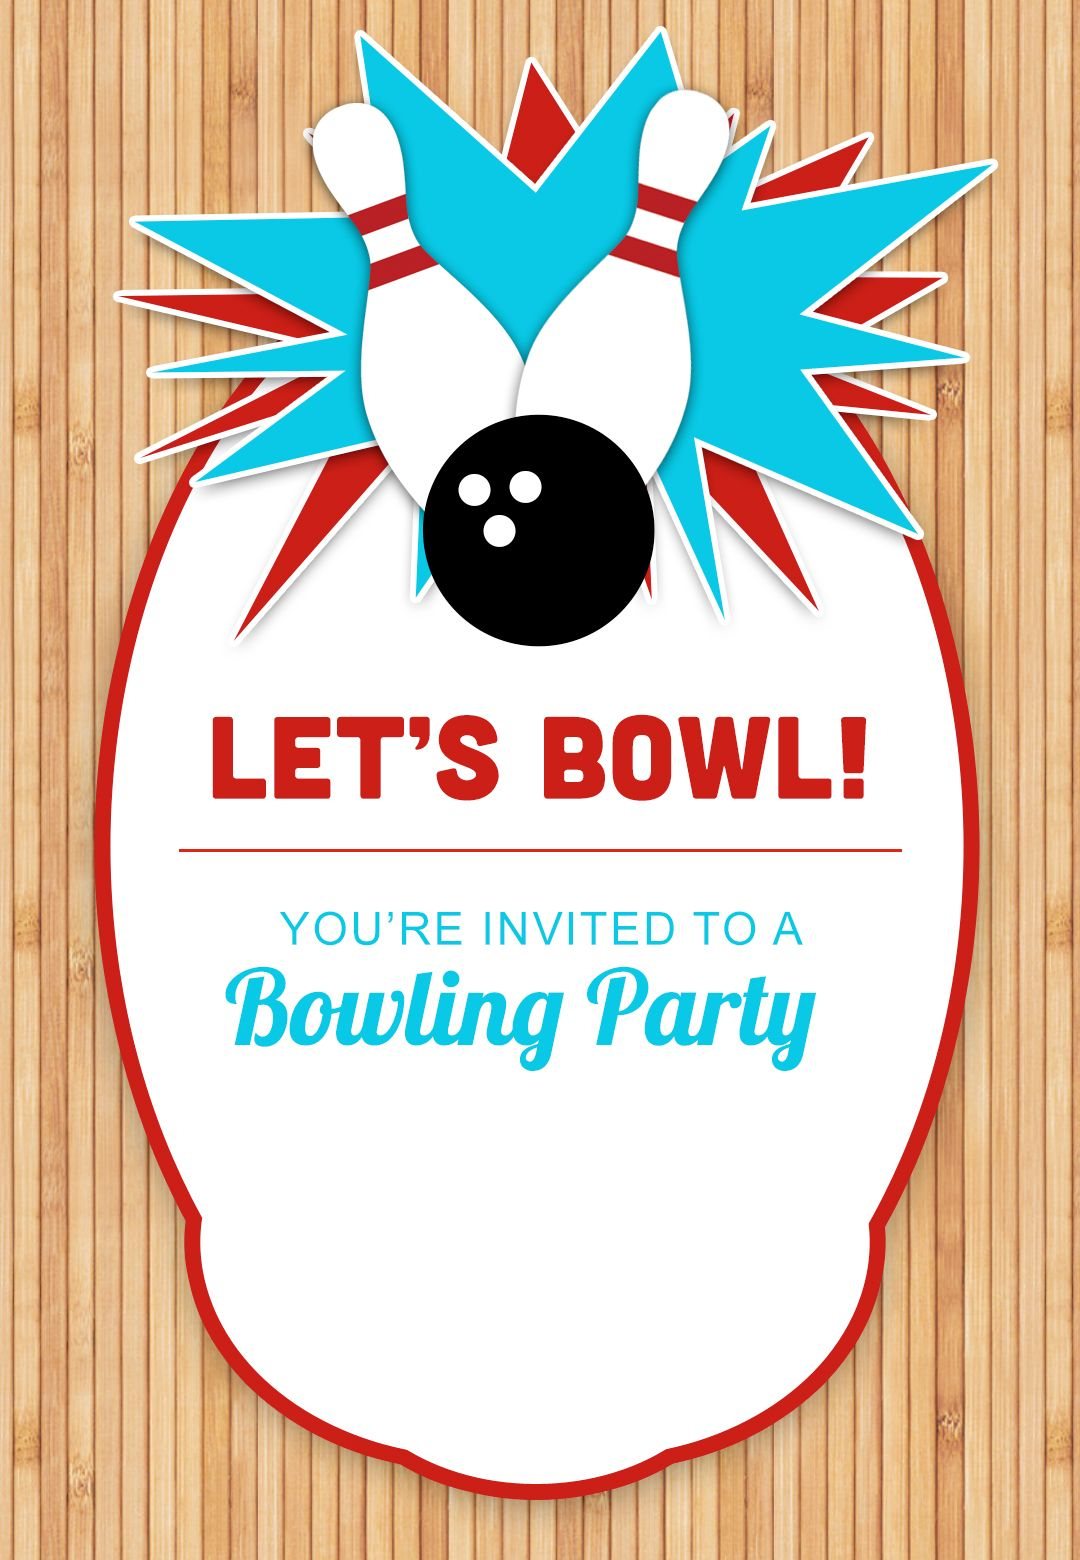 Bowling Party - Free Printable Birthday Invitation Template - Free Printable Bowling Birthday Party Invitations